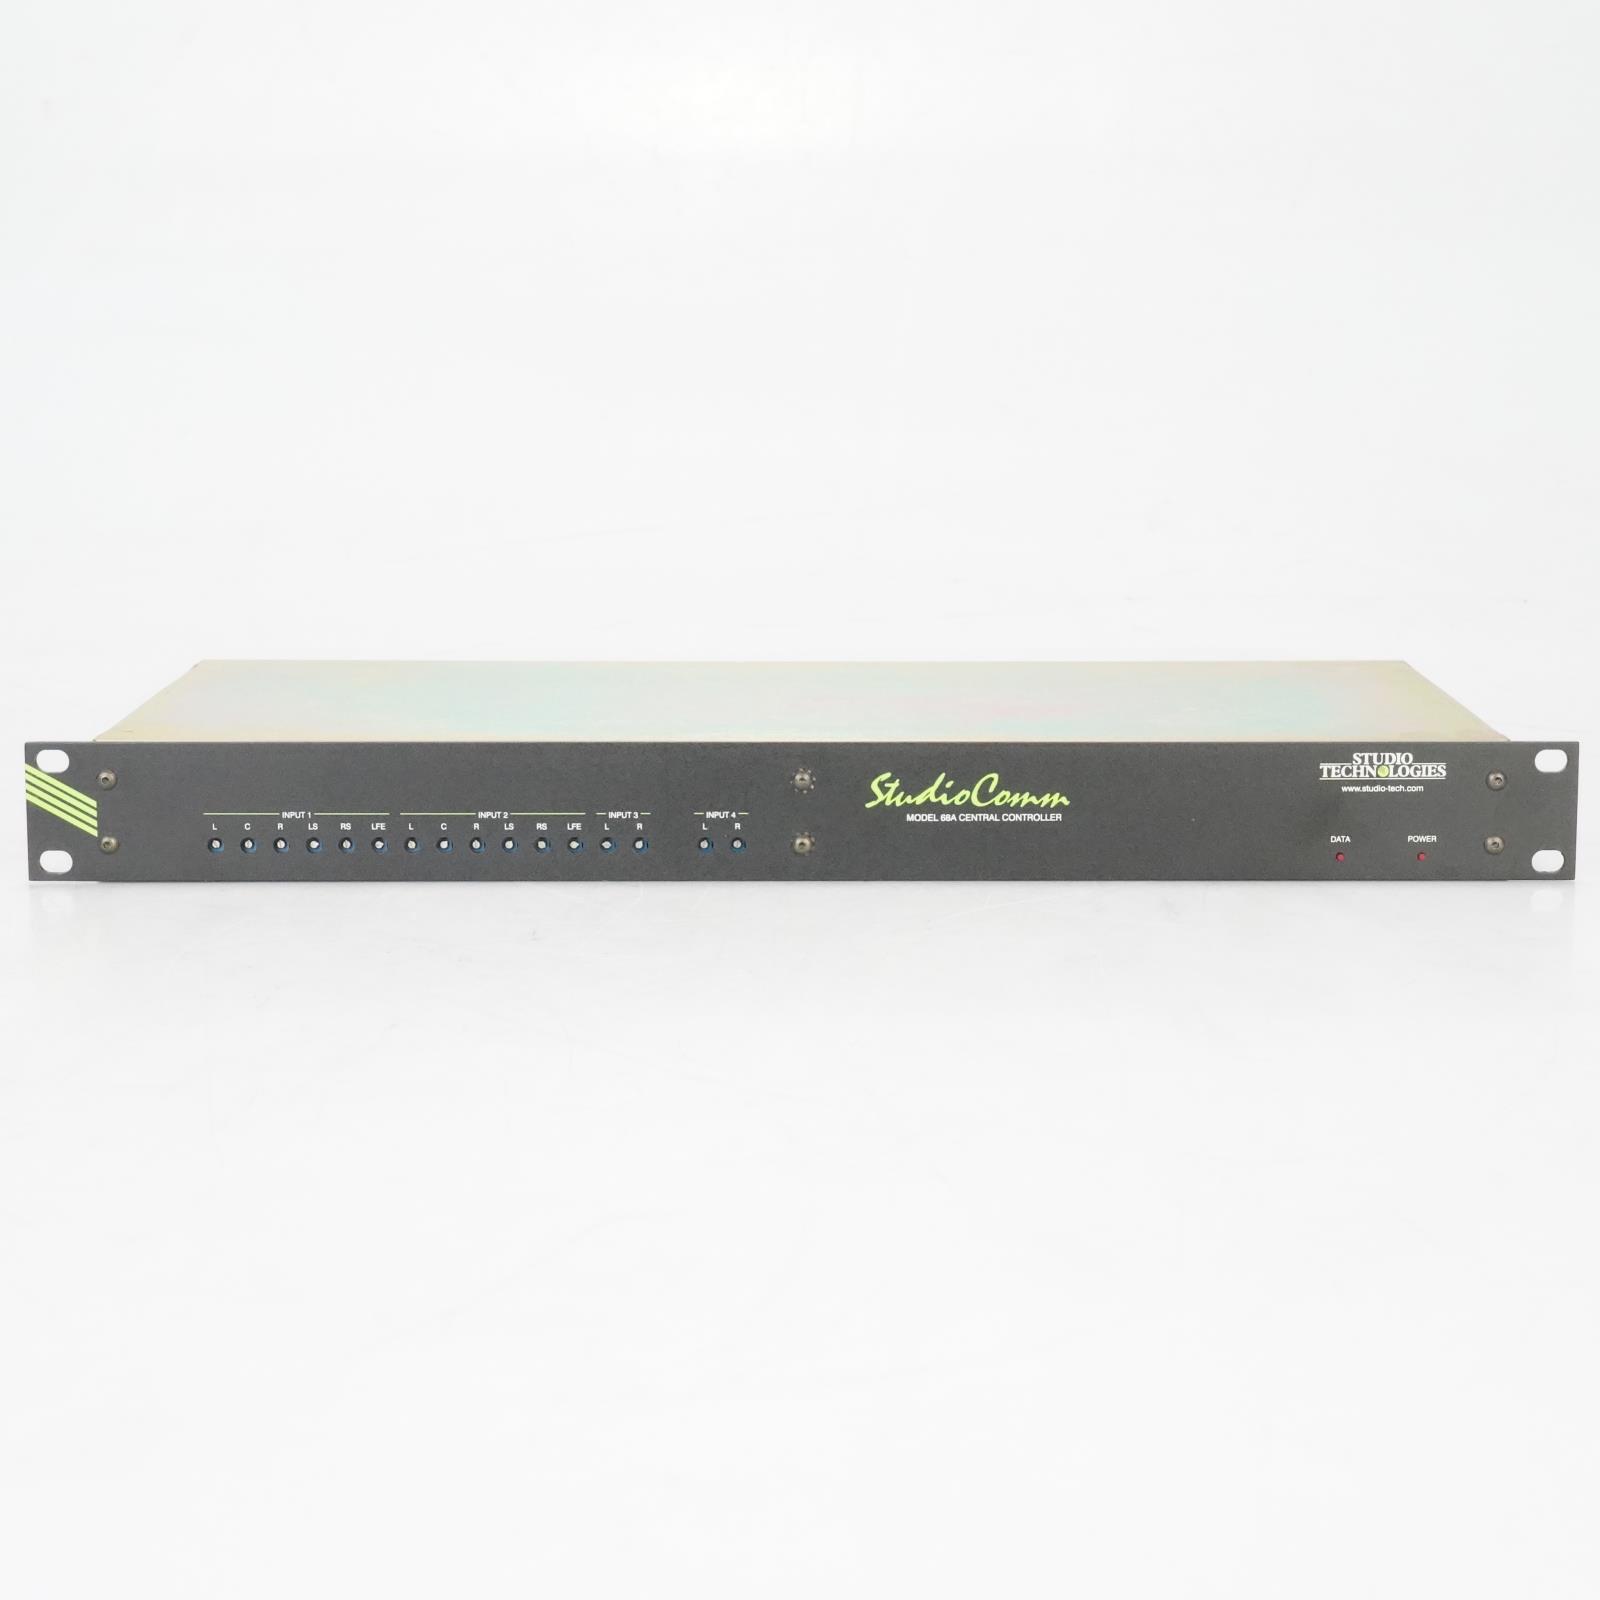 Studio Technologies Comm 69A Console 68A Monitor Controller Ed Cherney #39070